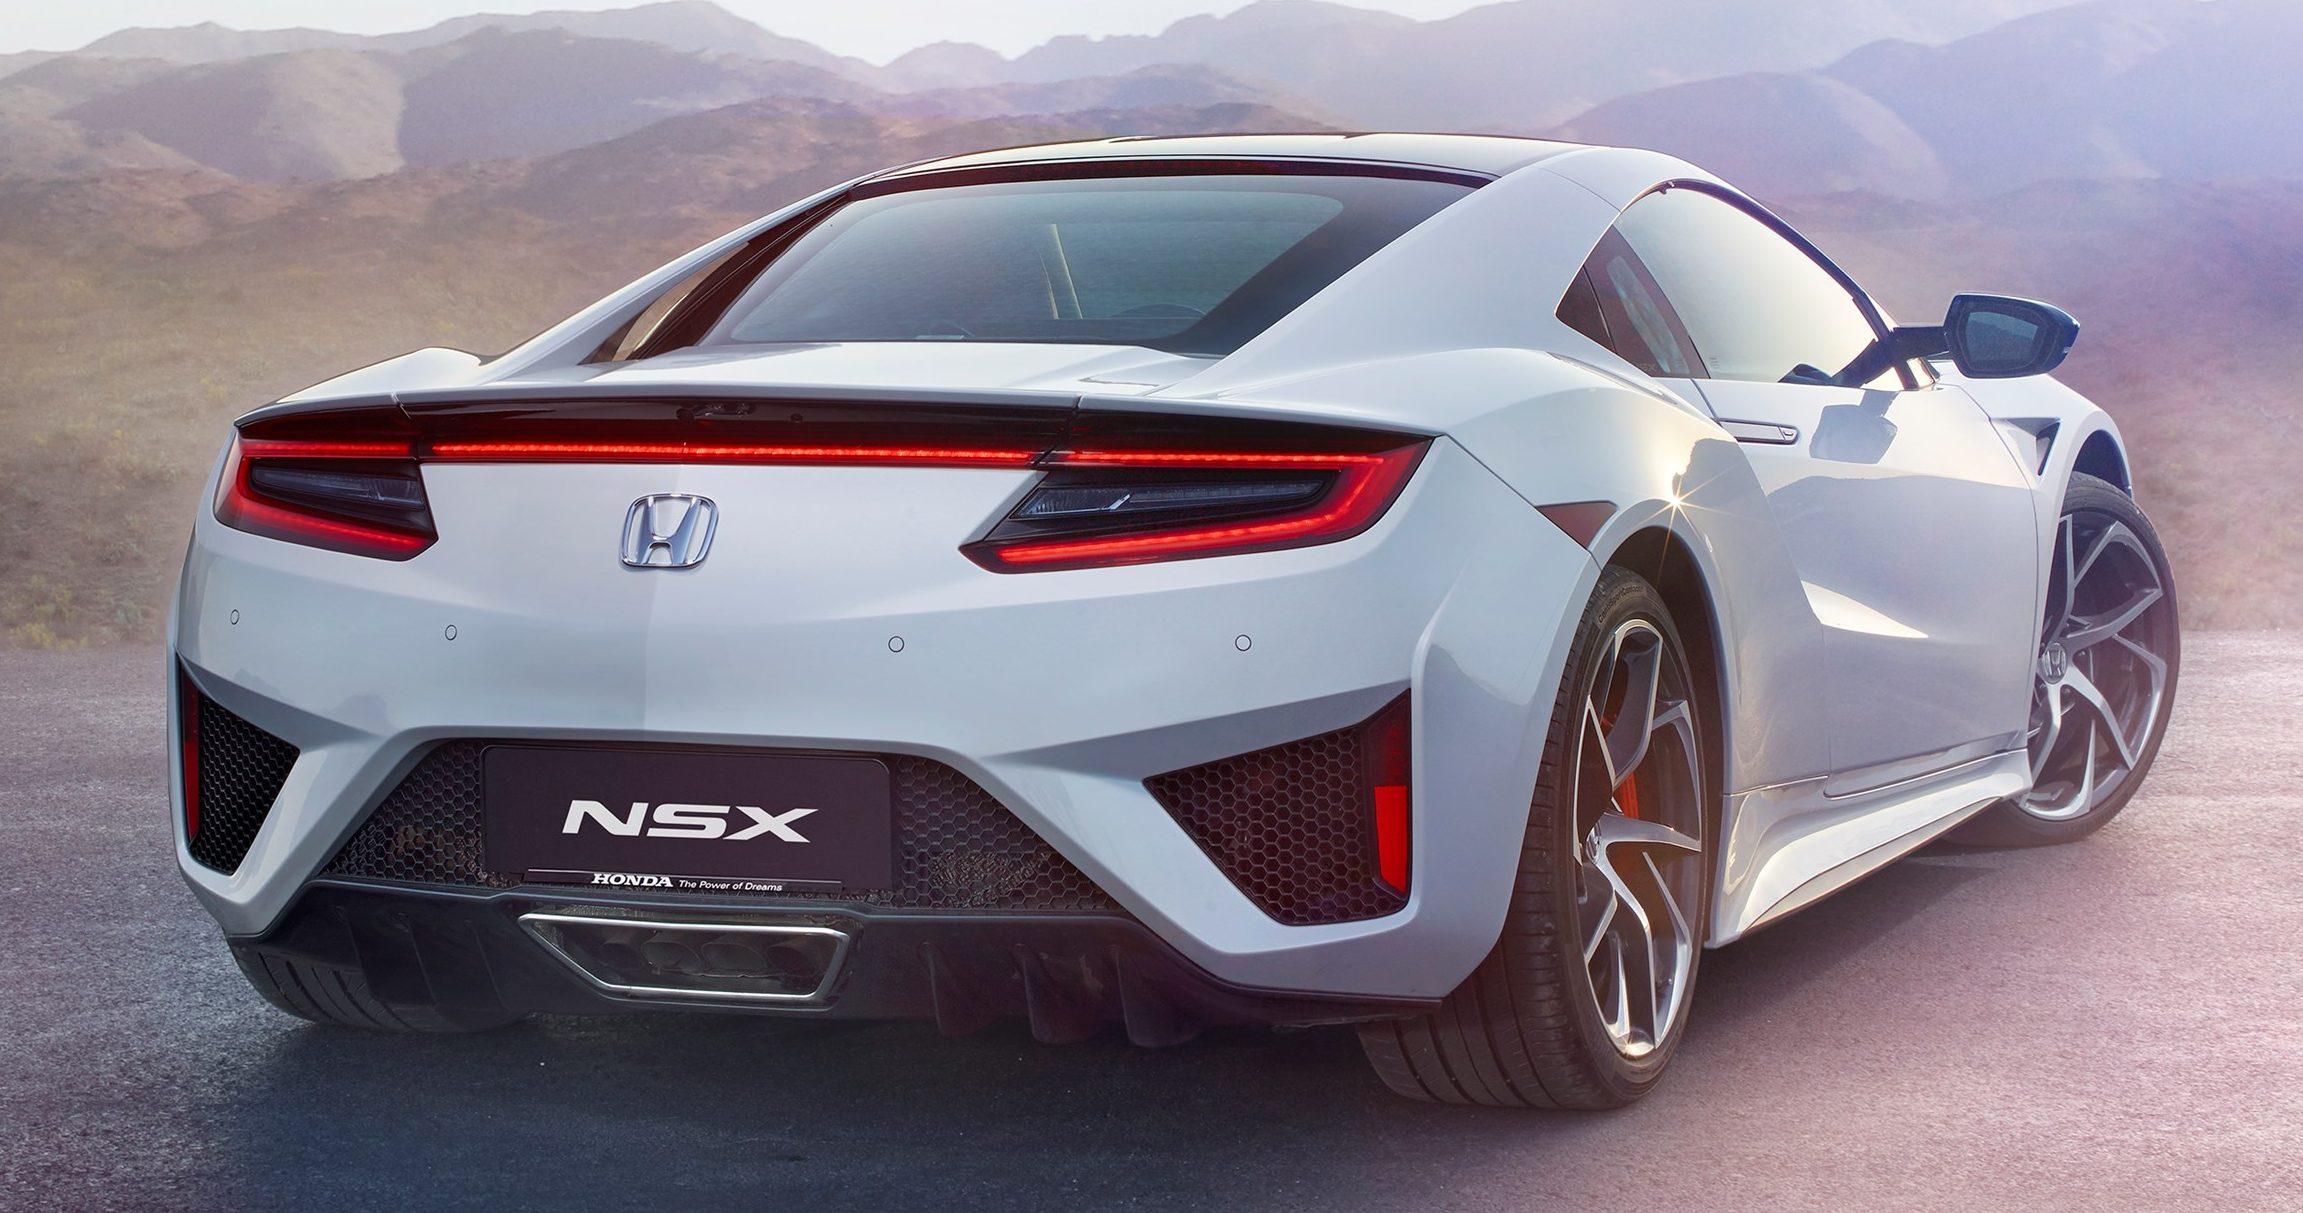 GALLERY New Honda NSX makes its European debut Image